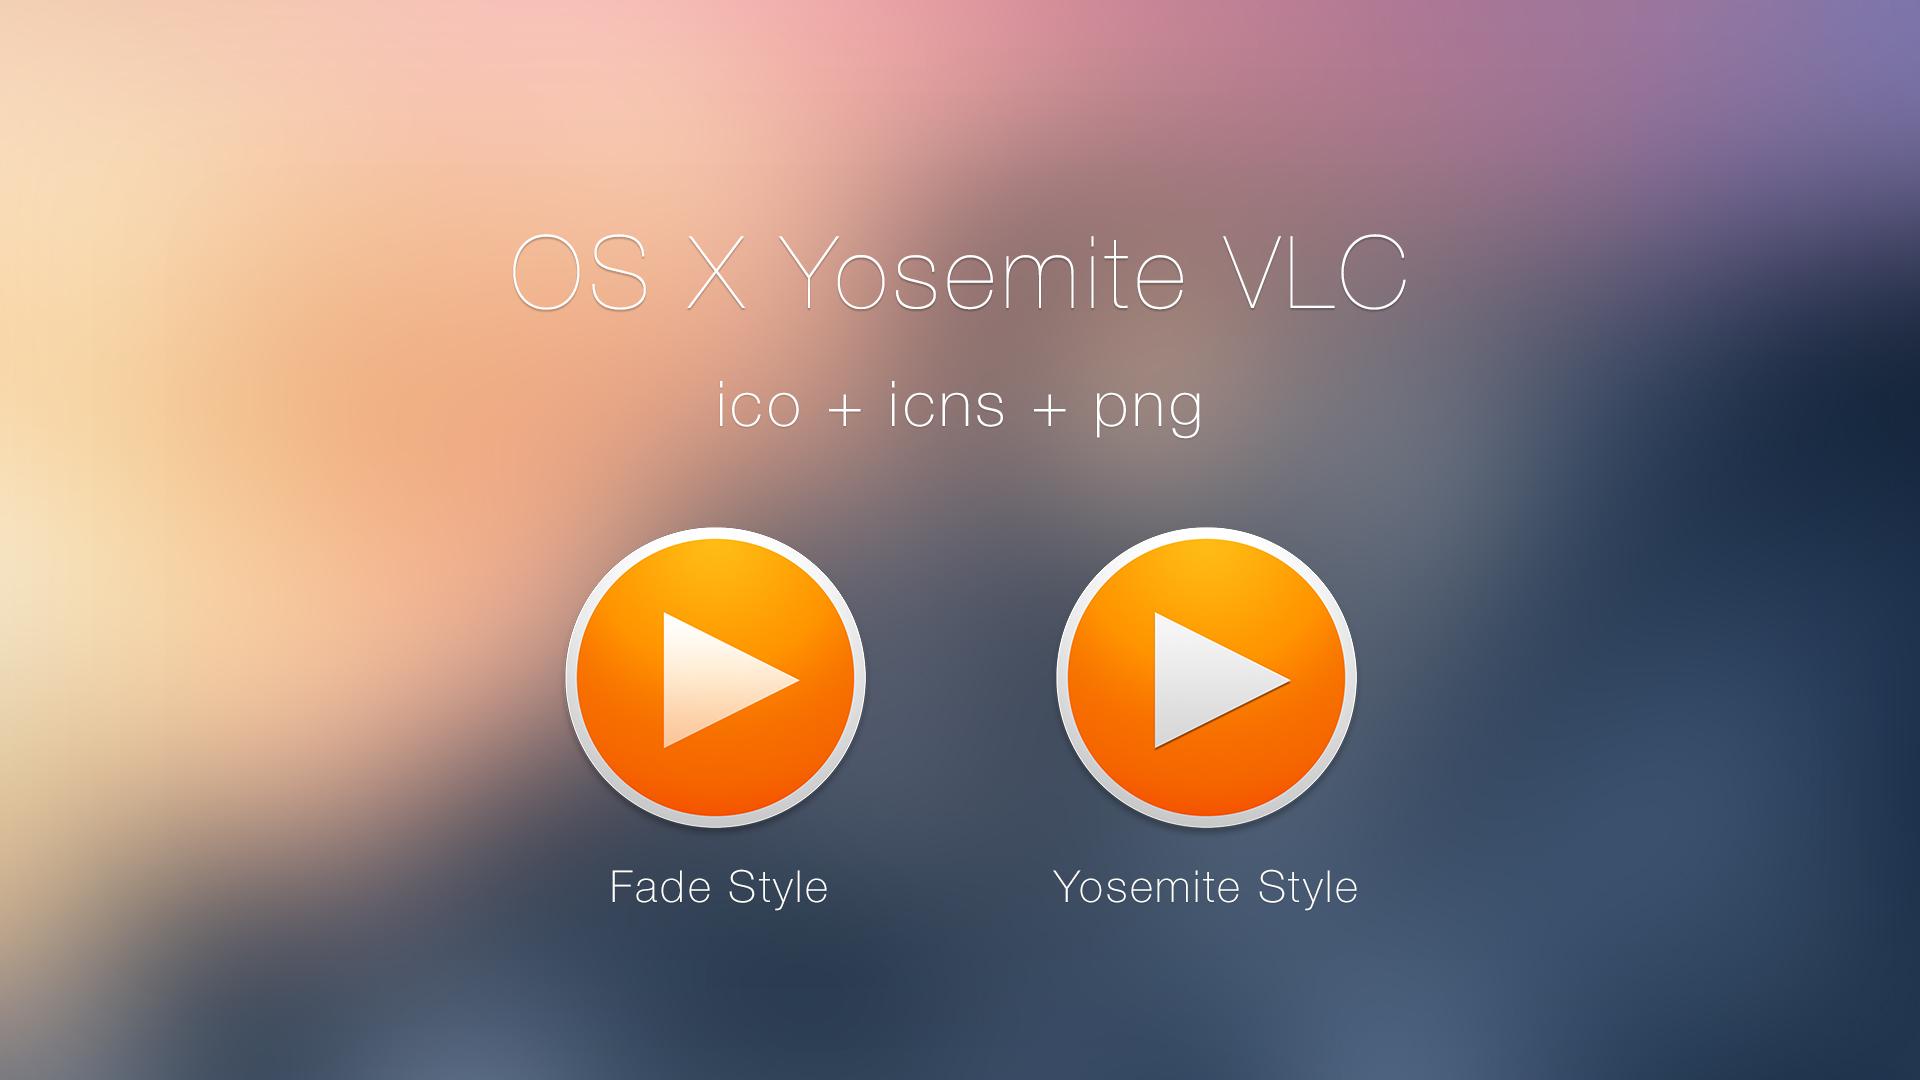 Google chrome themes yosemite - Vndesign 32 7 Vlc Yosemite Style Icons By Jasonzigrino